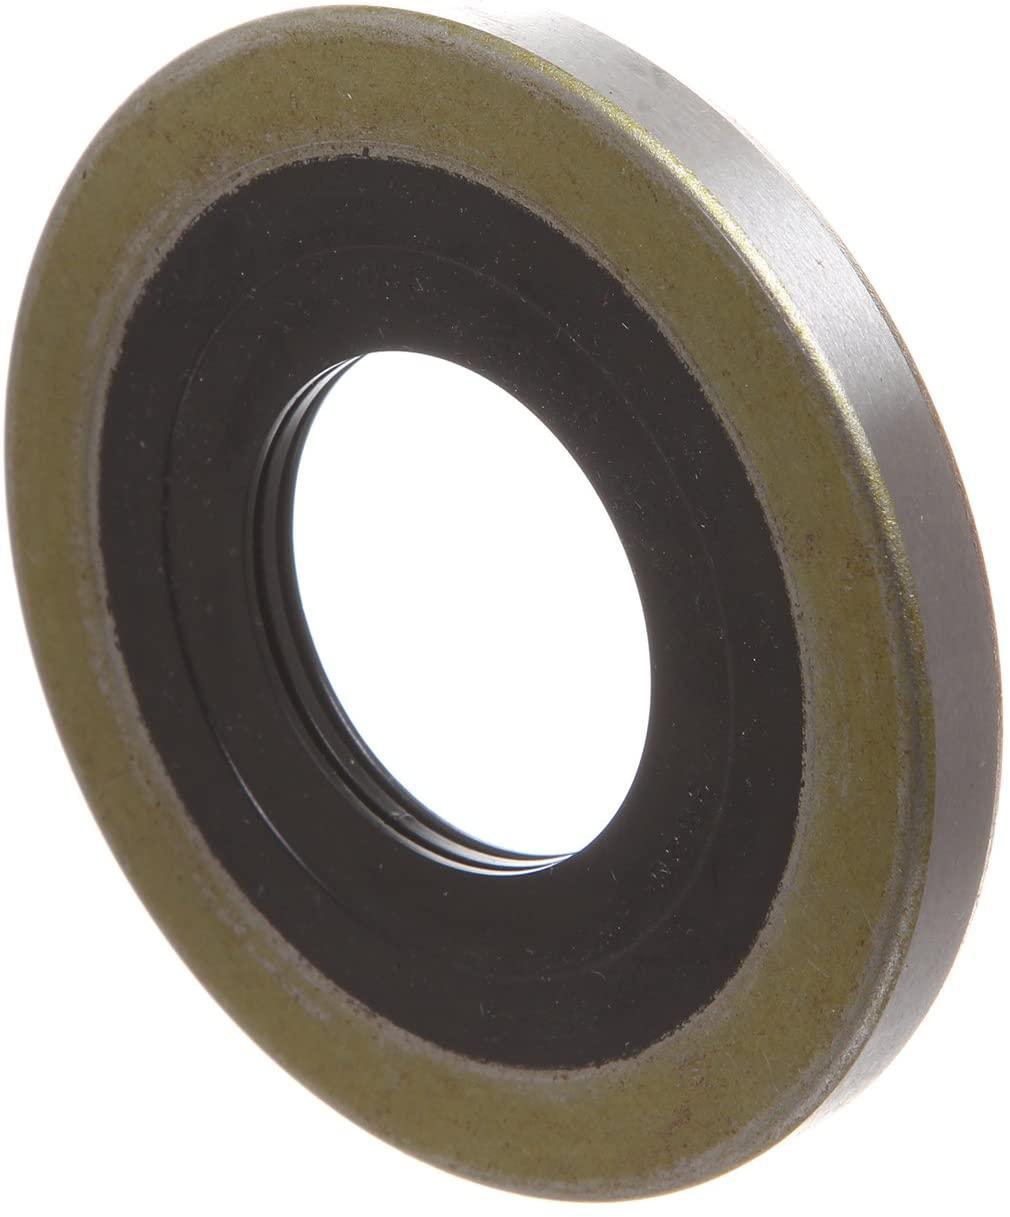 REPLACEMENTKITS.COM Brand Gimbal Bearing Seal Fits Mercruiser Stern Drives Replaces 26-88416